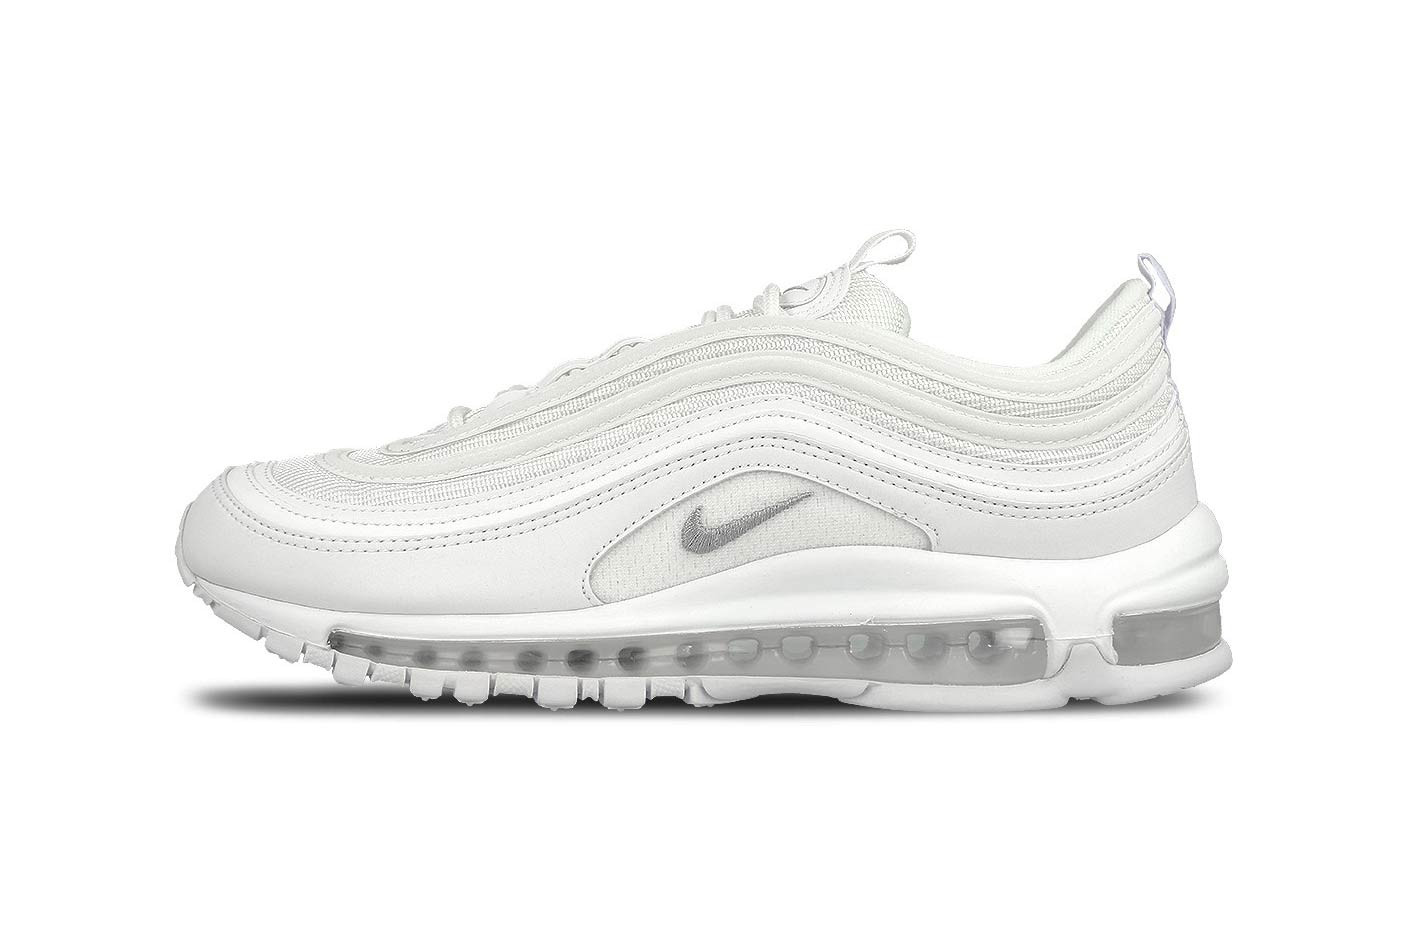 Nike Air Max 97 Triple White Restock